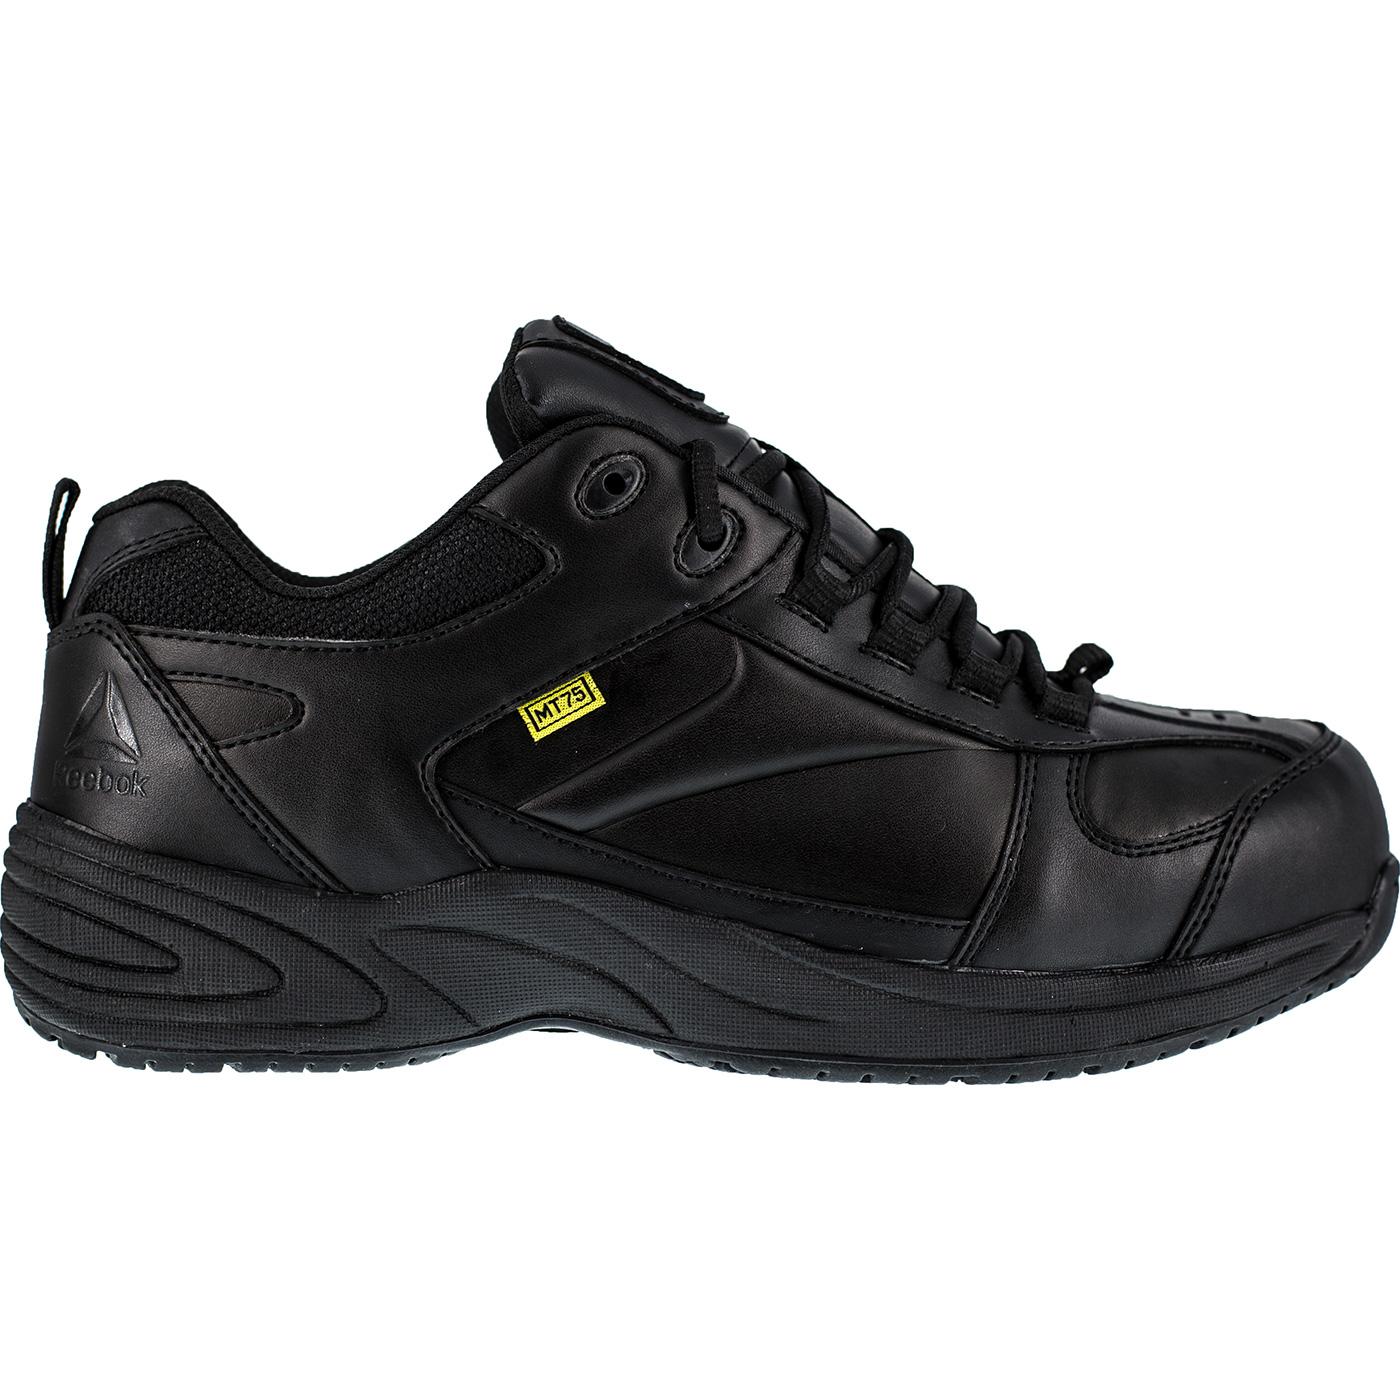 f36d01006f52c8 Black Athletic Reebok Composite Toe Met Guard Work Shoe